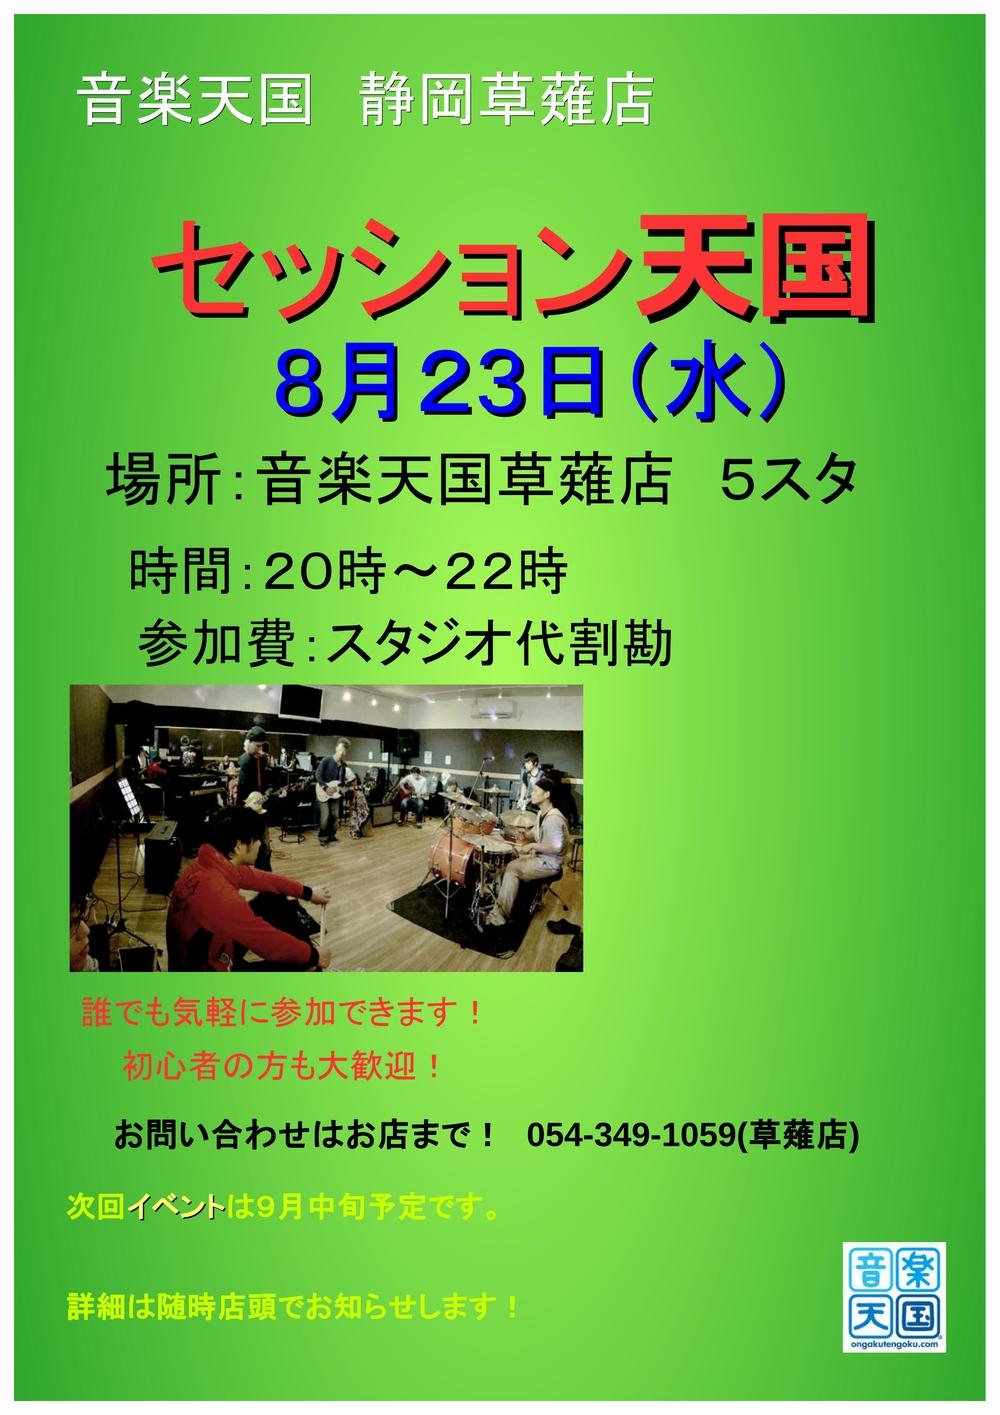 【セッション天国】音楽天国・静岡草薙店8月23日(水)開催